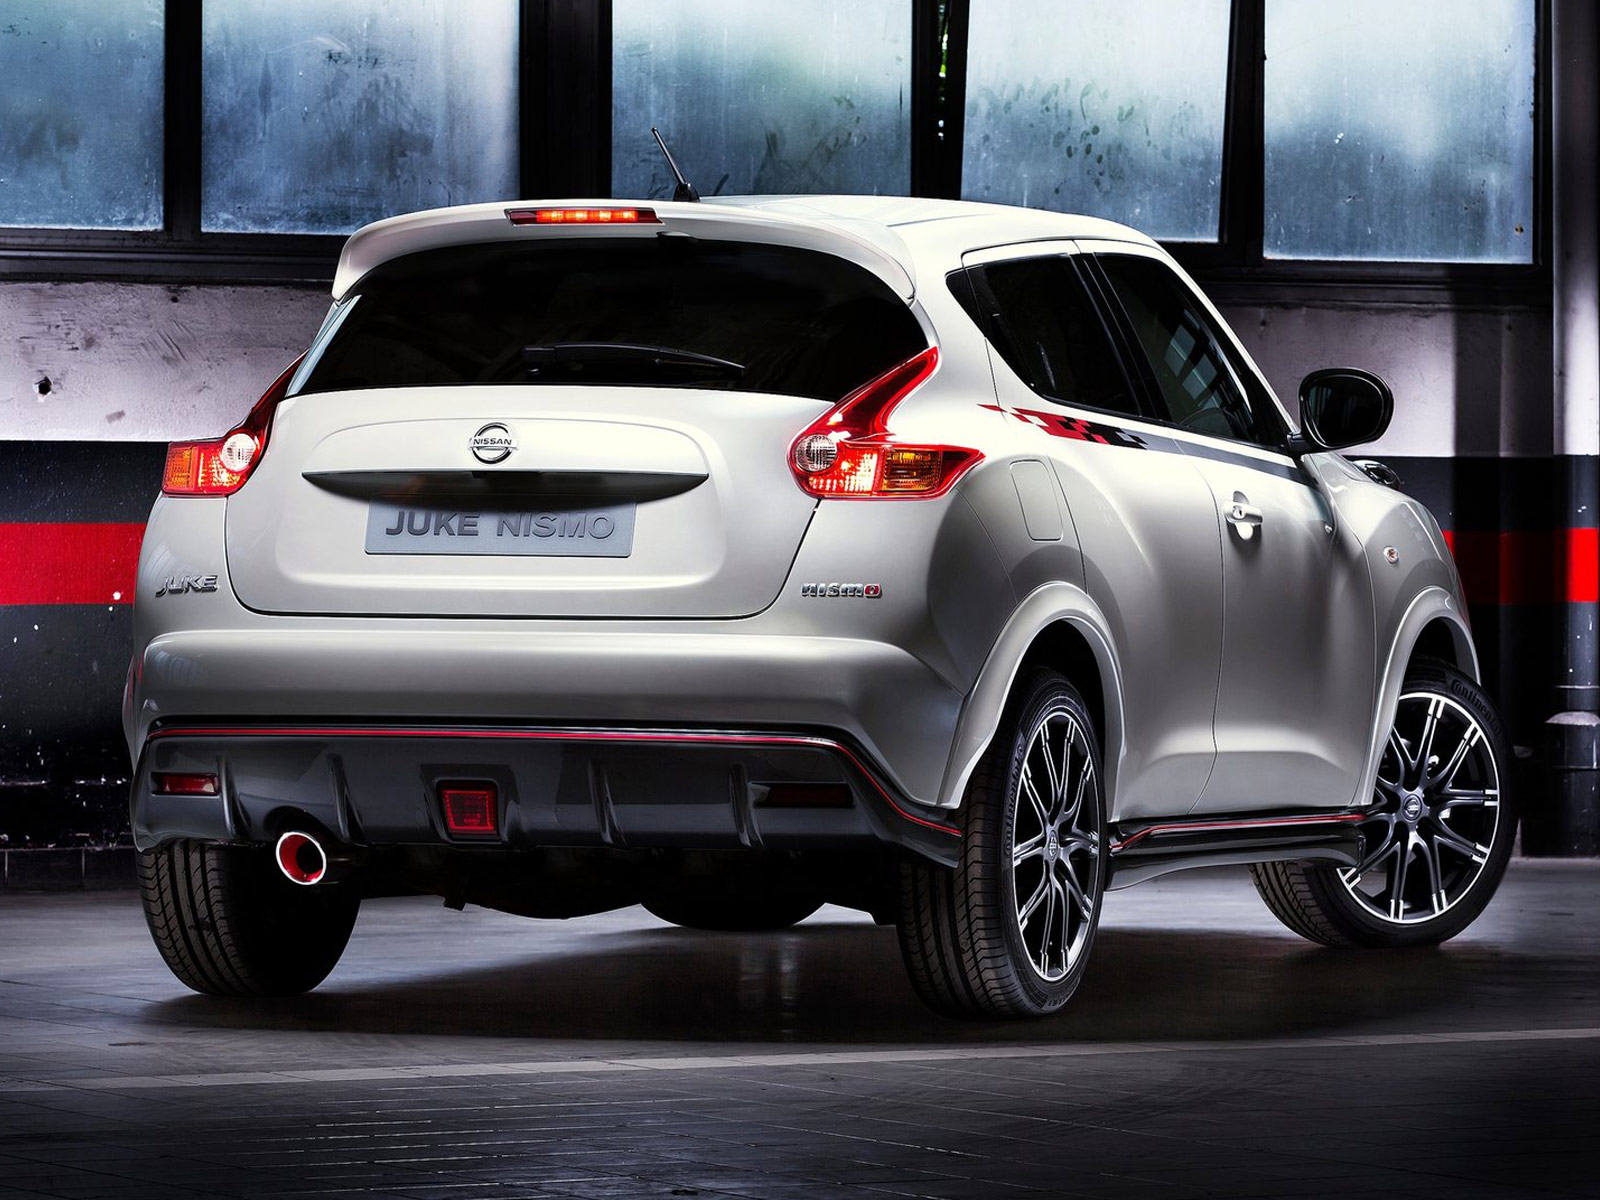 2013 Nissan Juke Nismo Insurance Information